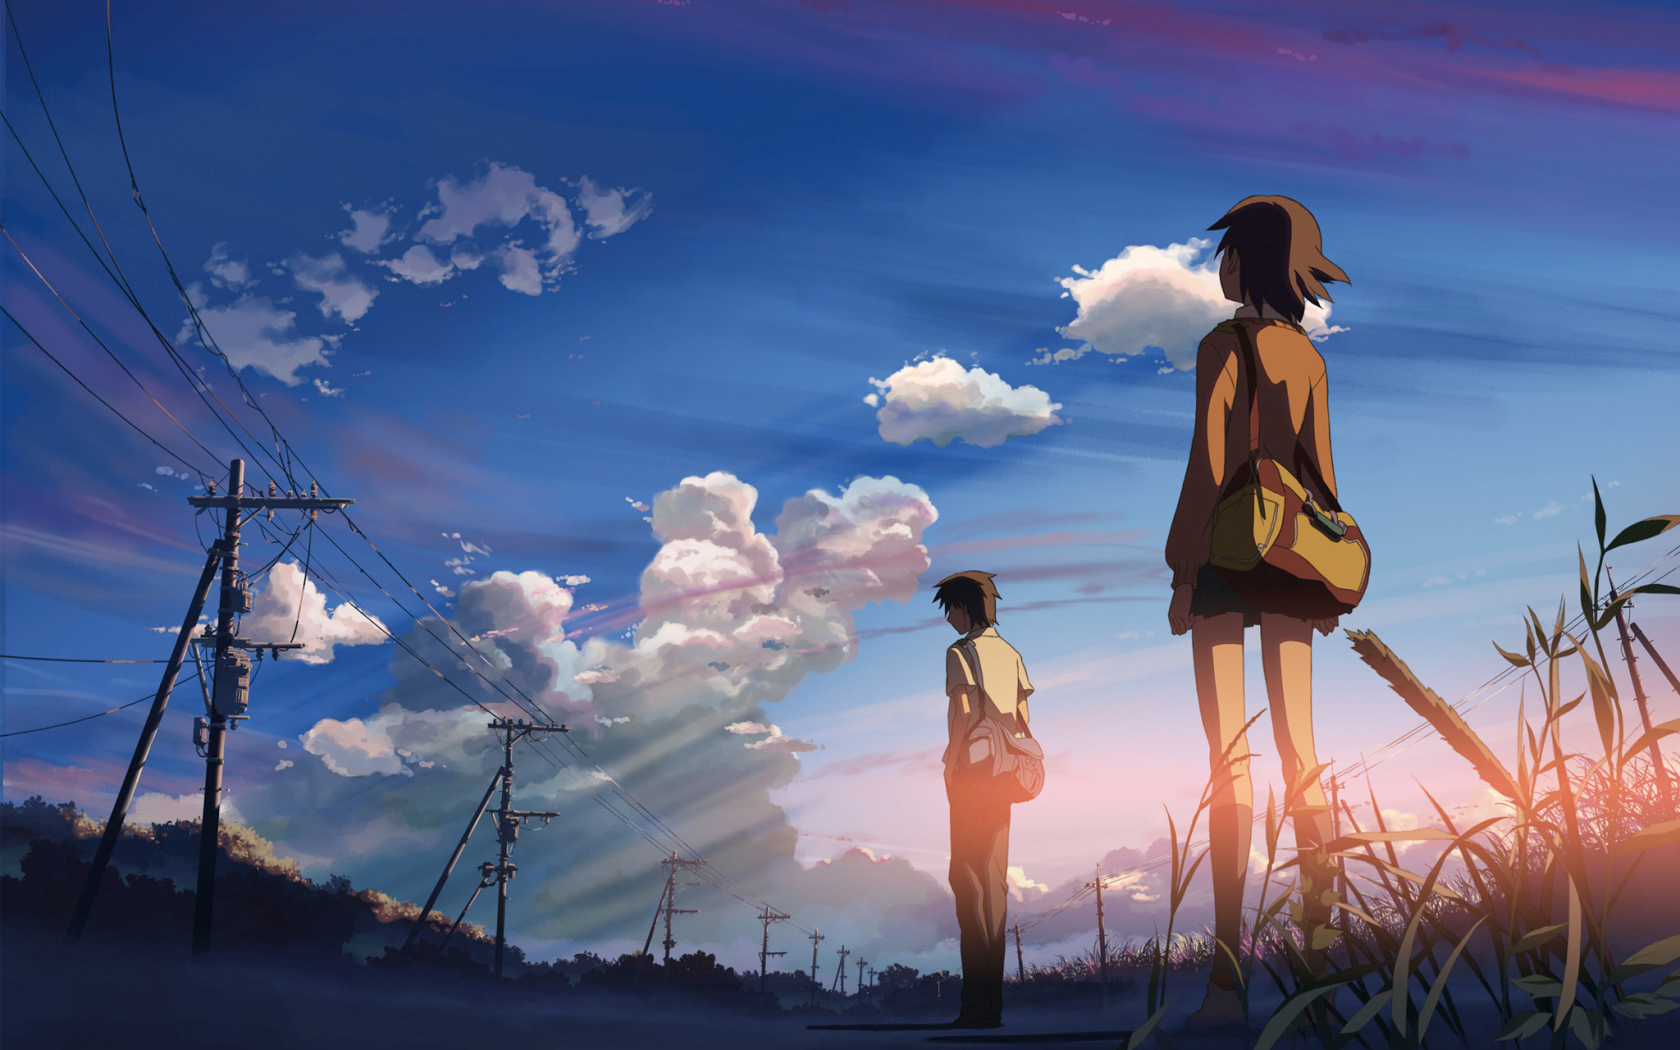 Free Download Anime Love Couple Manga Country Field Blue Sky Art